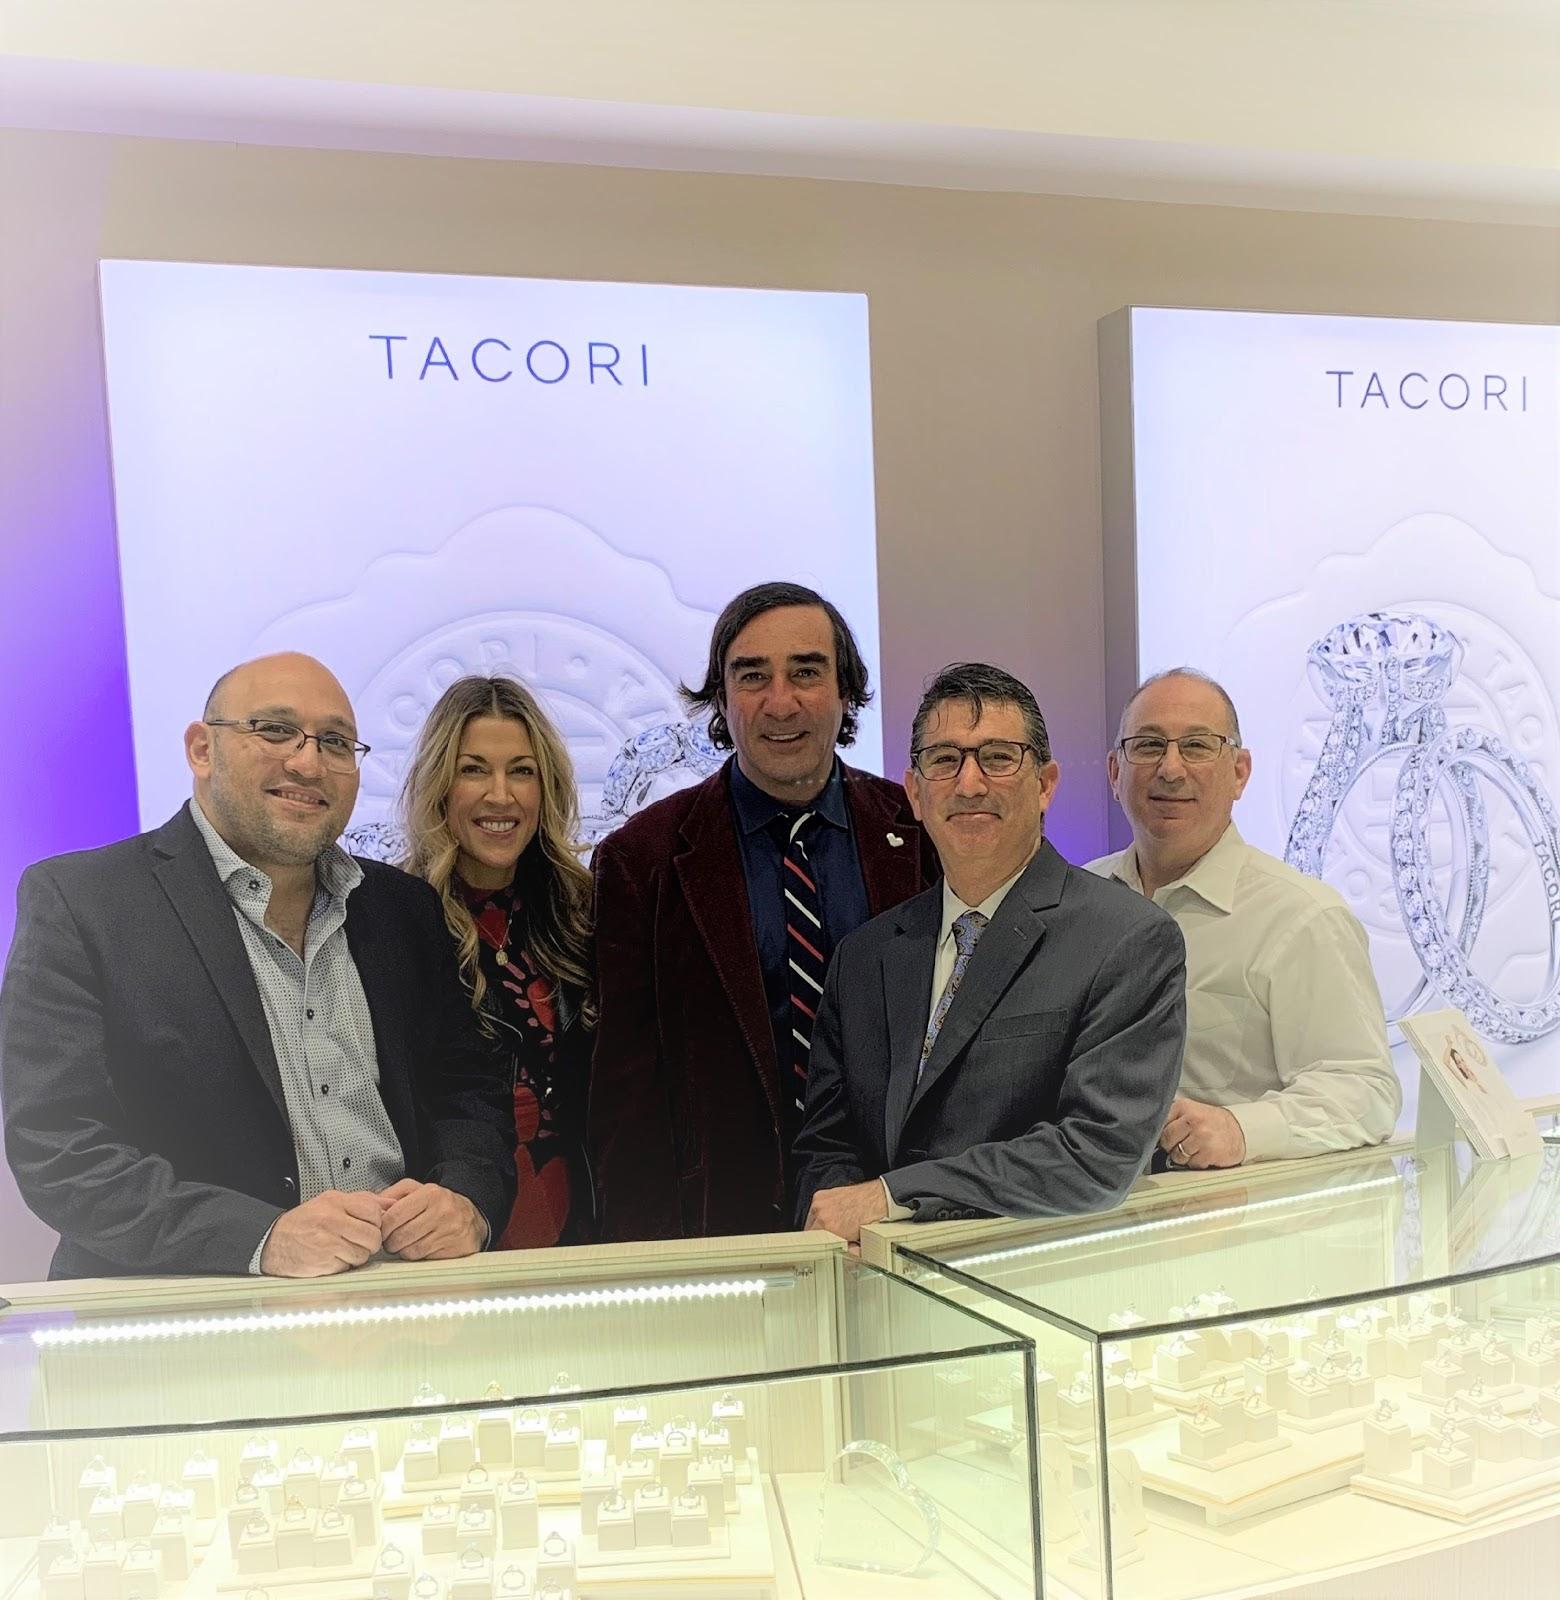 Tacori Founder Paul Tacorian Visits Adlers Jewelers